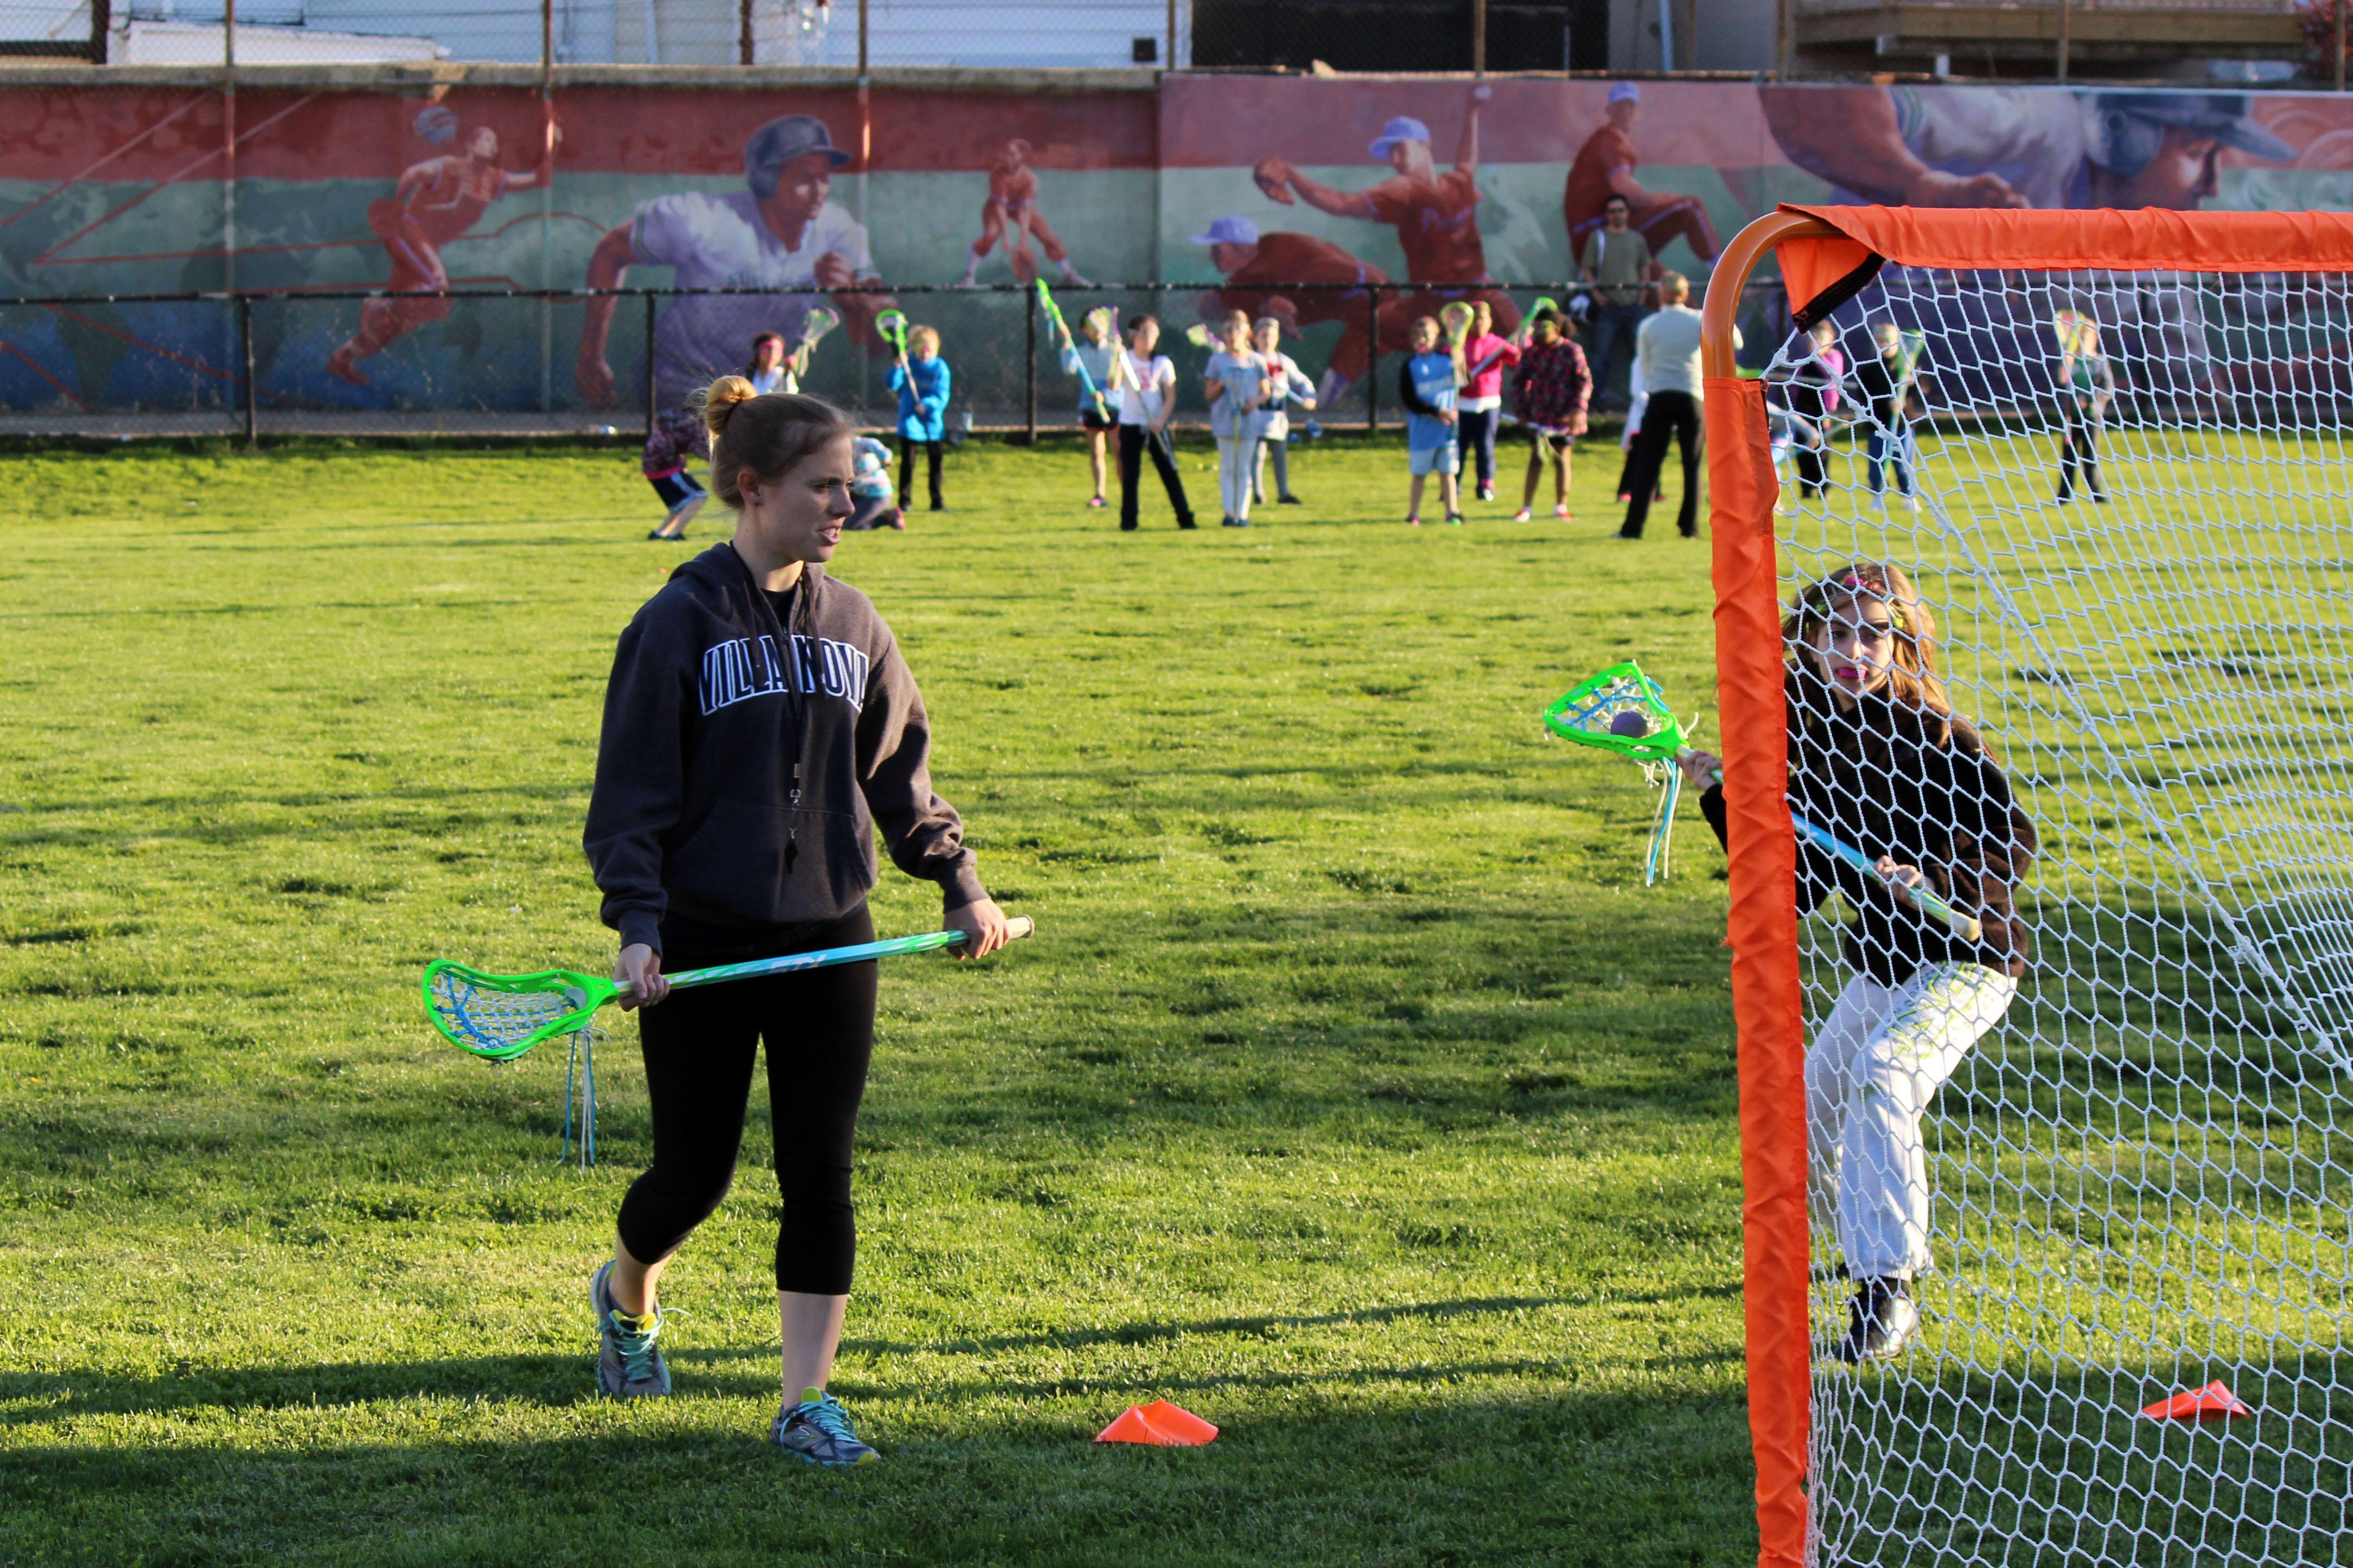 Jenna Allen, a lacrosse player from Villanova University, coaches the girls through a shooting drill.